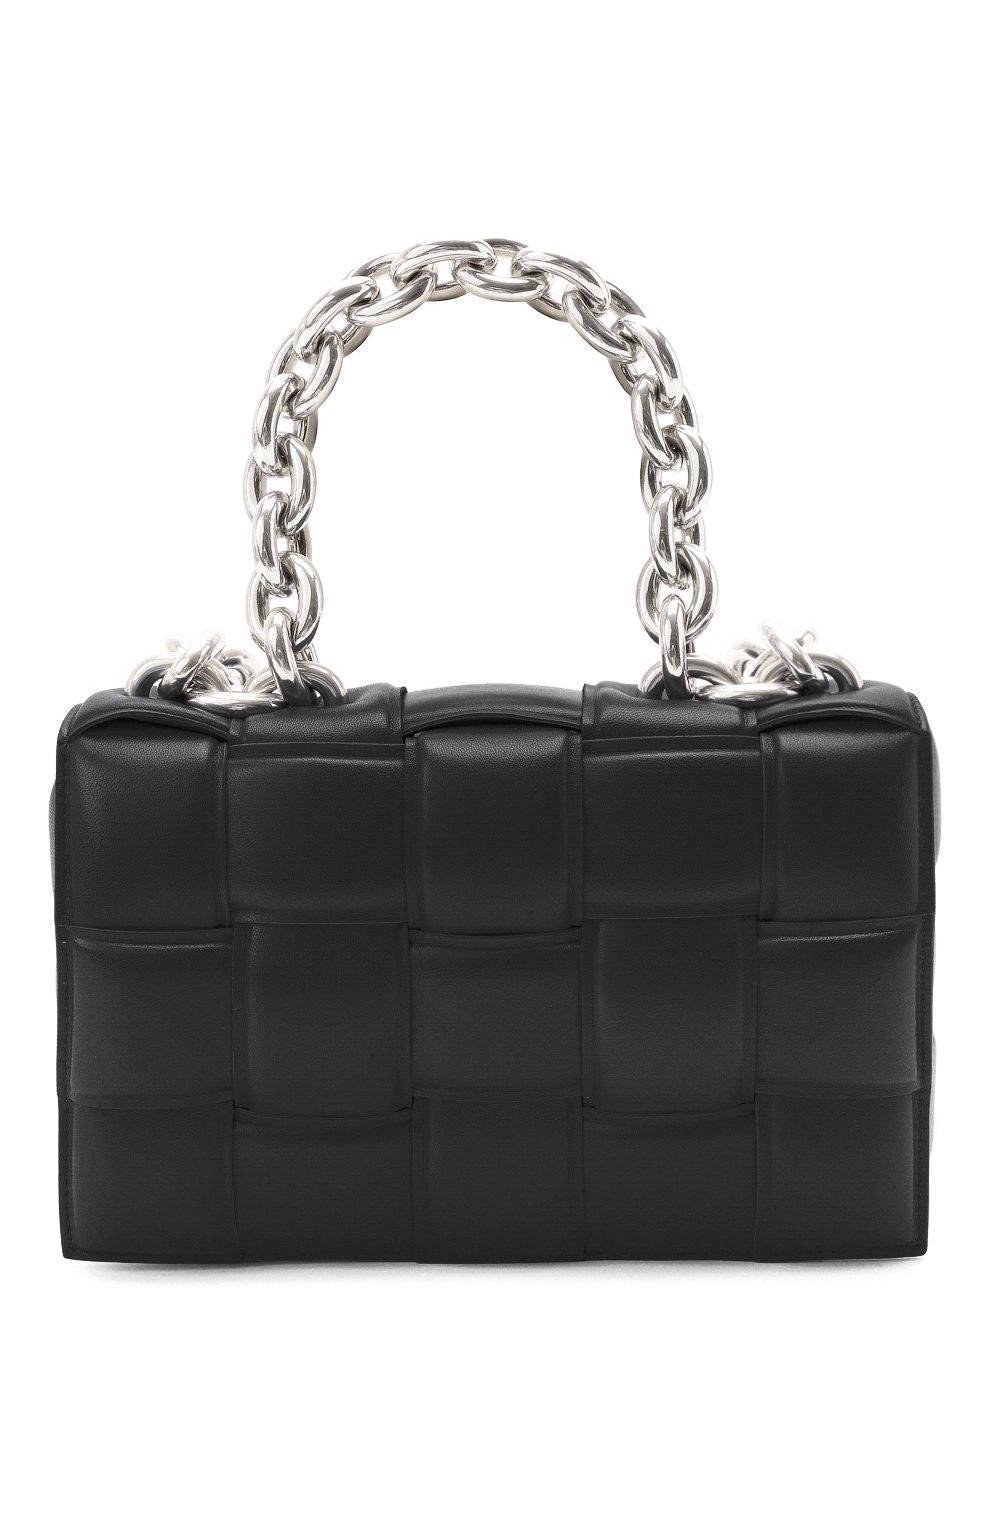 Женская сумка chain cassette BOTTEGA VENETA черного цвета, арт. 631421/VBWZ0 | Фото 1